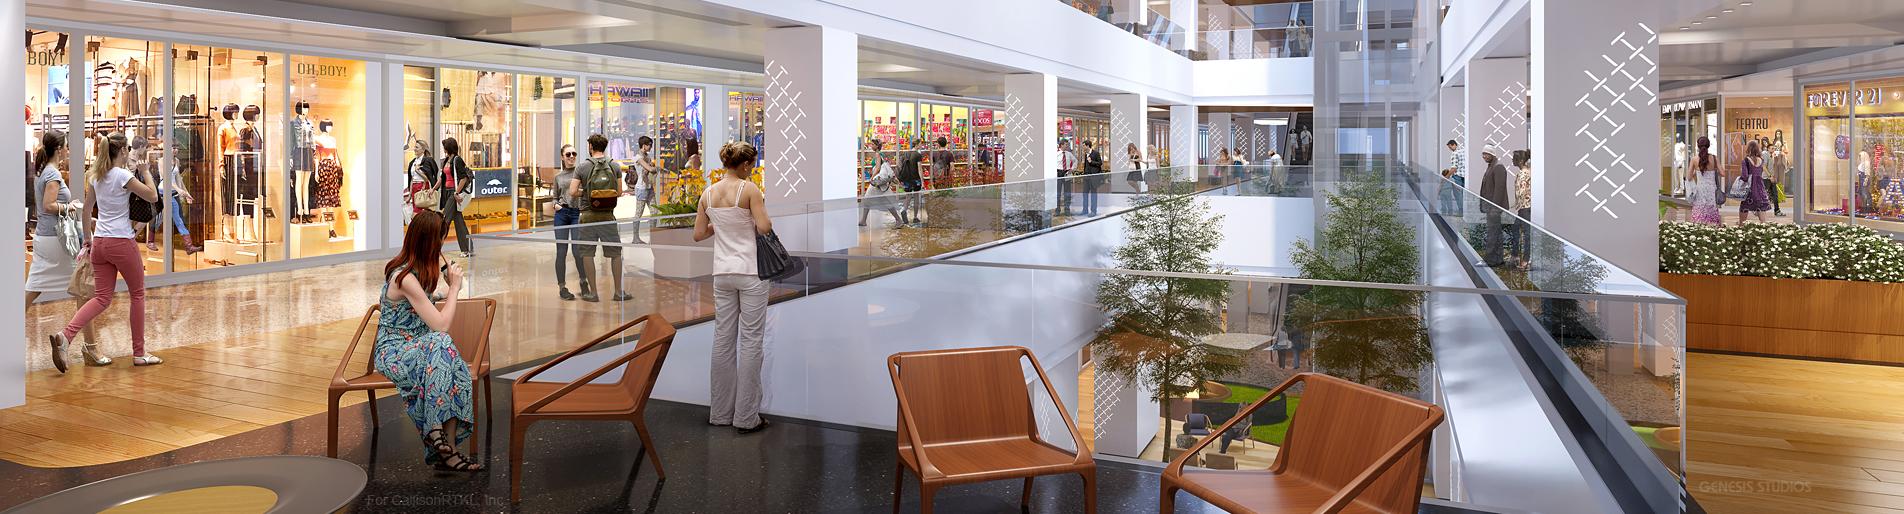 3D Interior Renderings of Shopping Tijuca Mall in Rio de Janeiro for CallisonRTKL